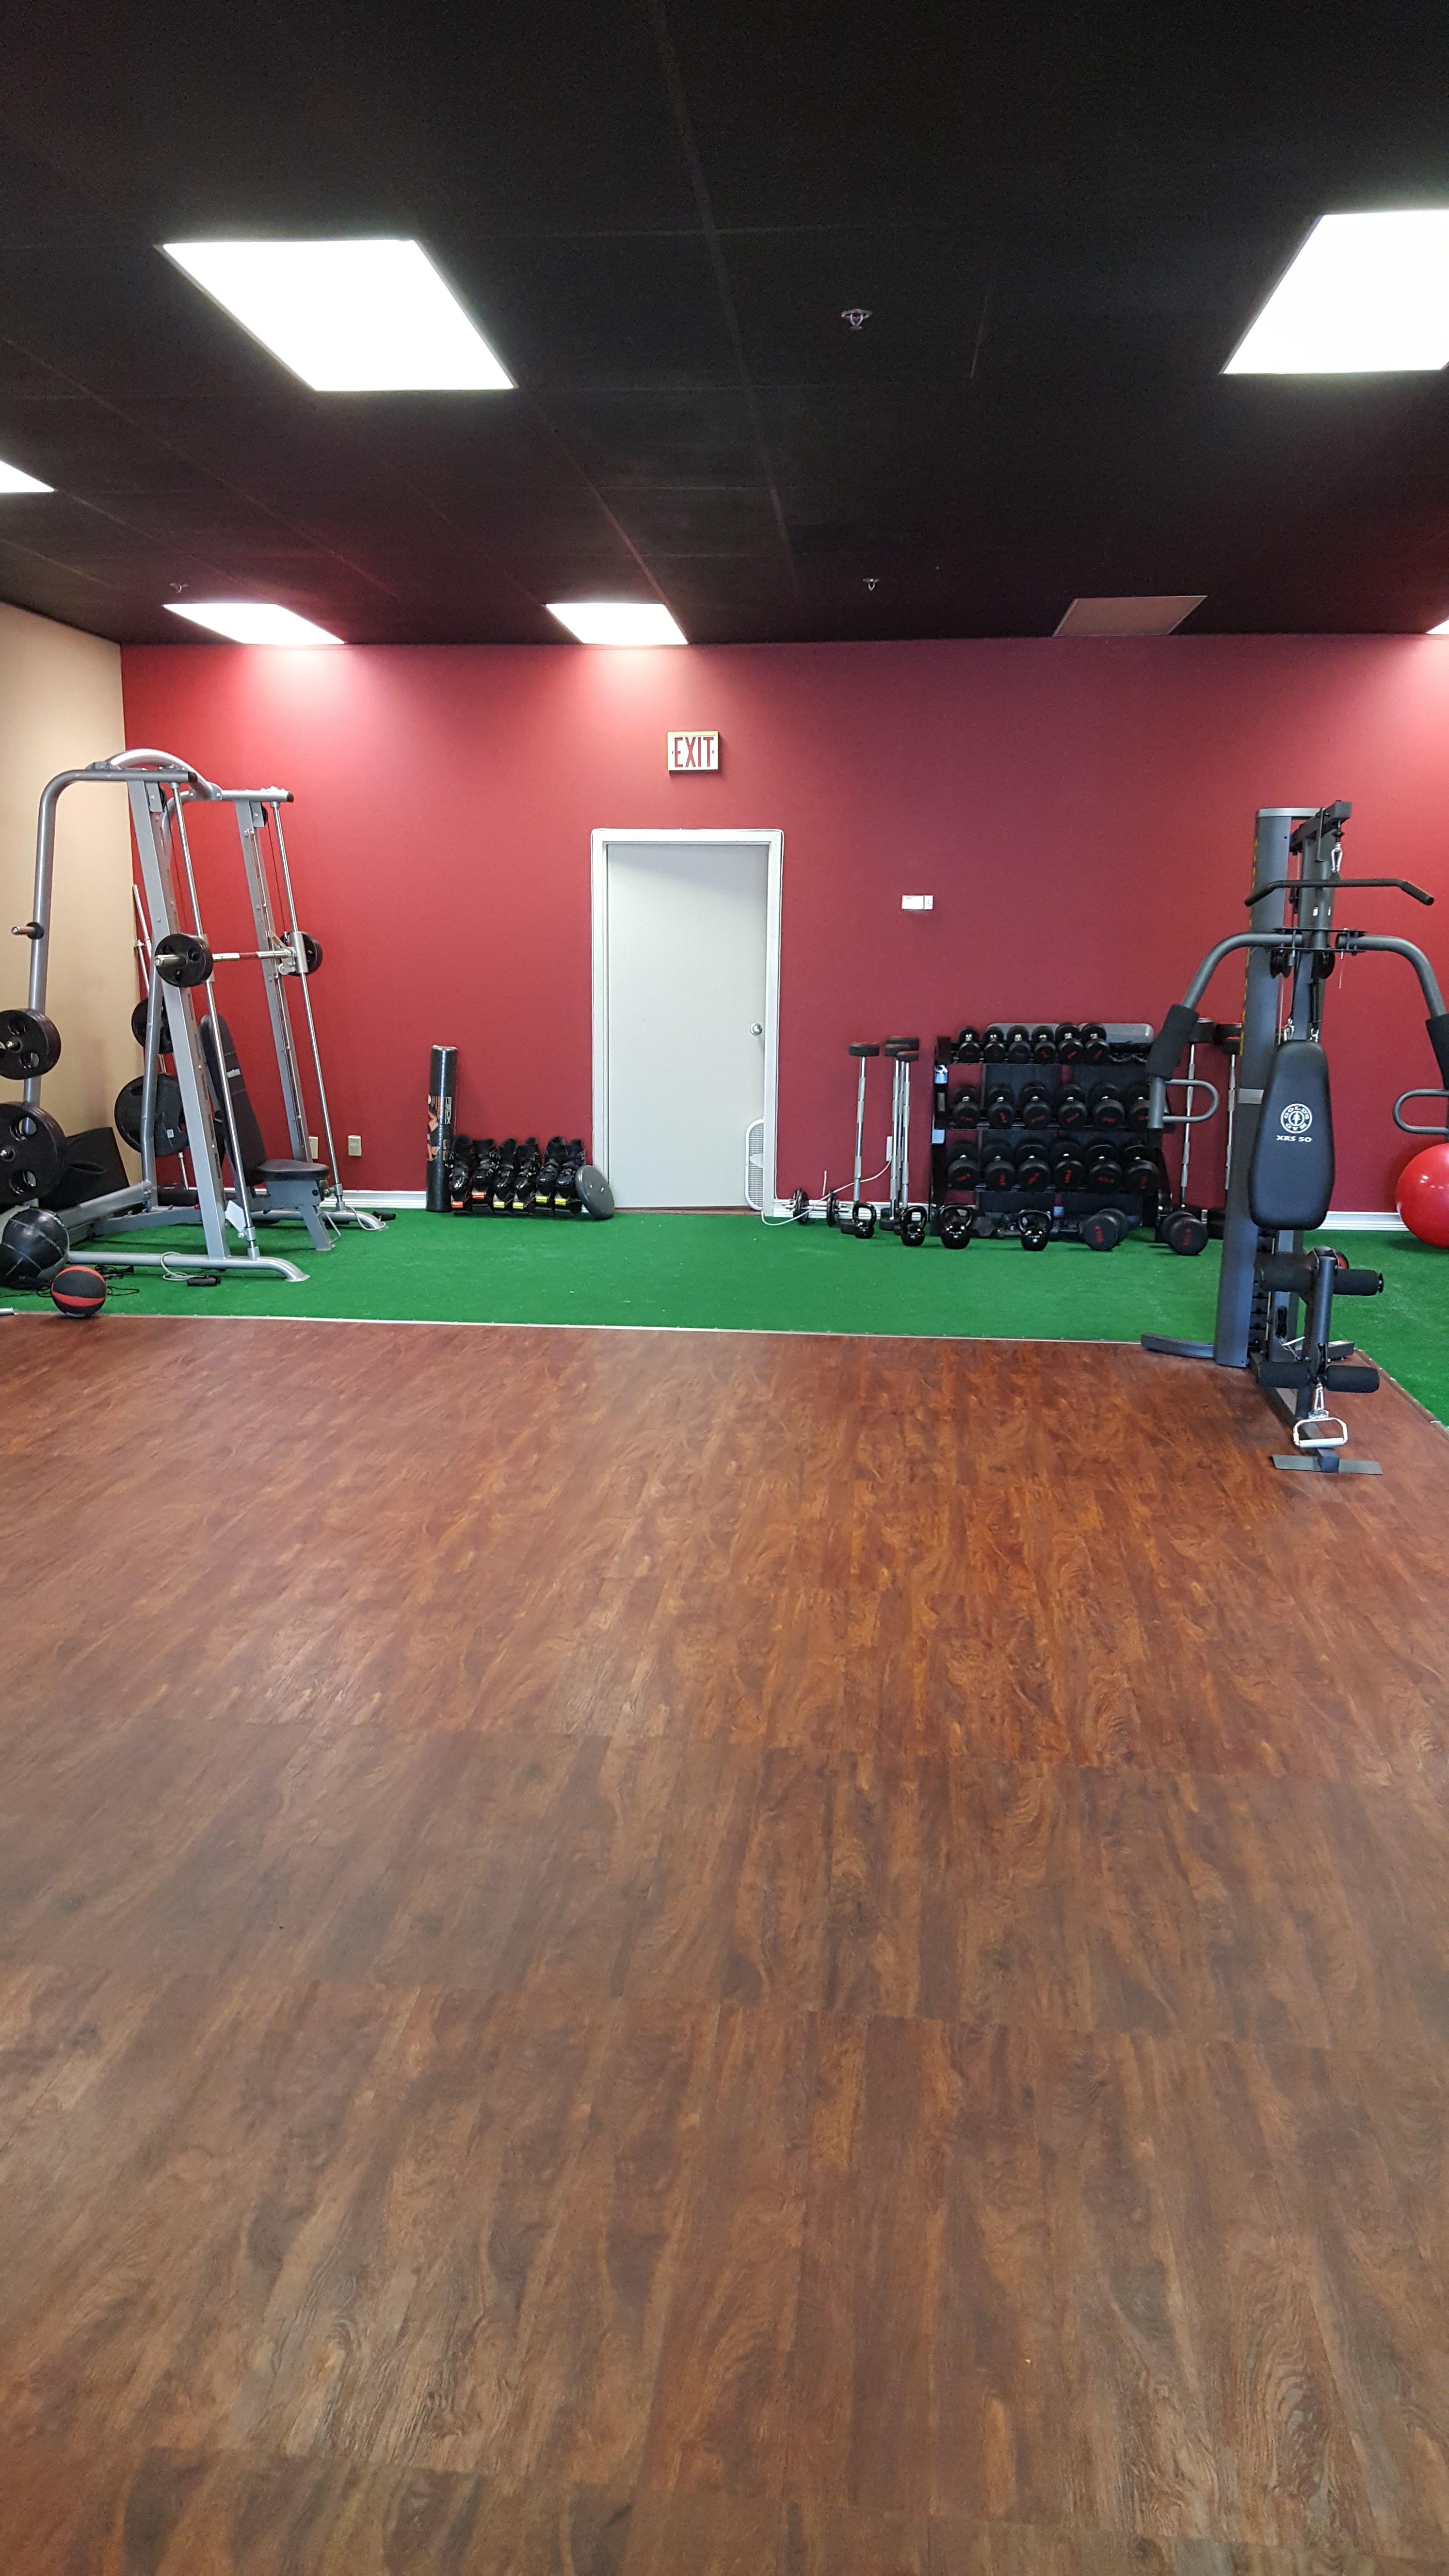 hardwood flooring companies atlanta ga of od fitness 40 dodd street se marietta ga 30060 yp com pertaining to f9b6fab6e35a9a1dd77d283279dd863c9248b86e